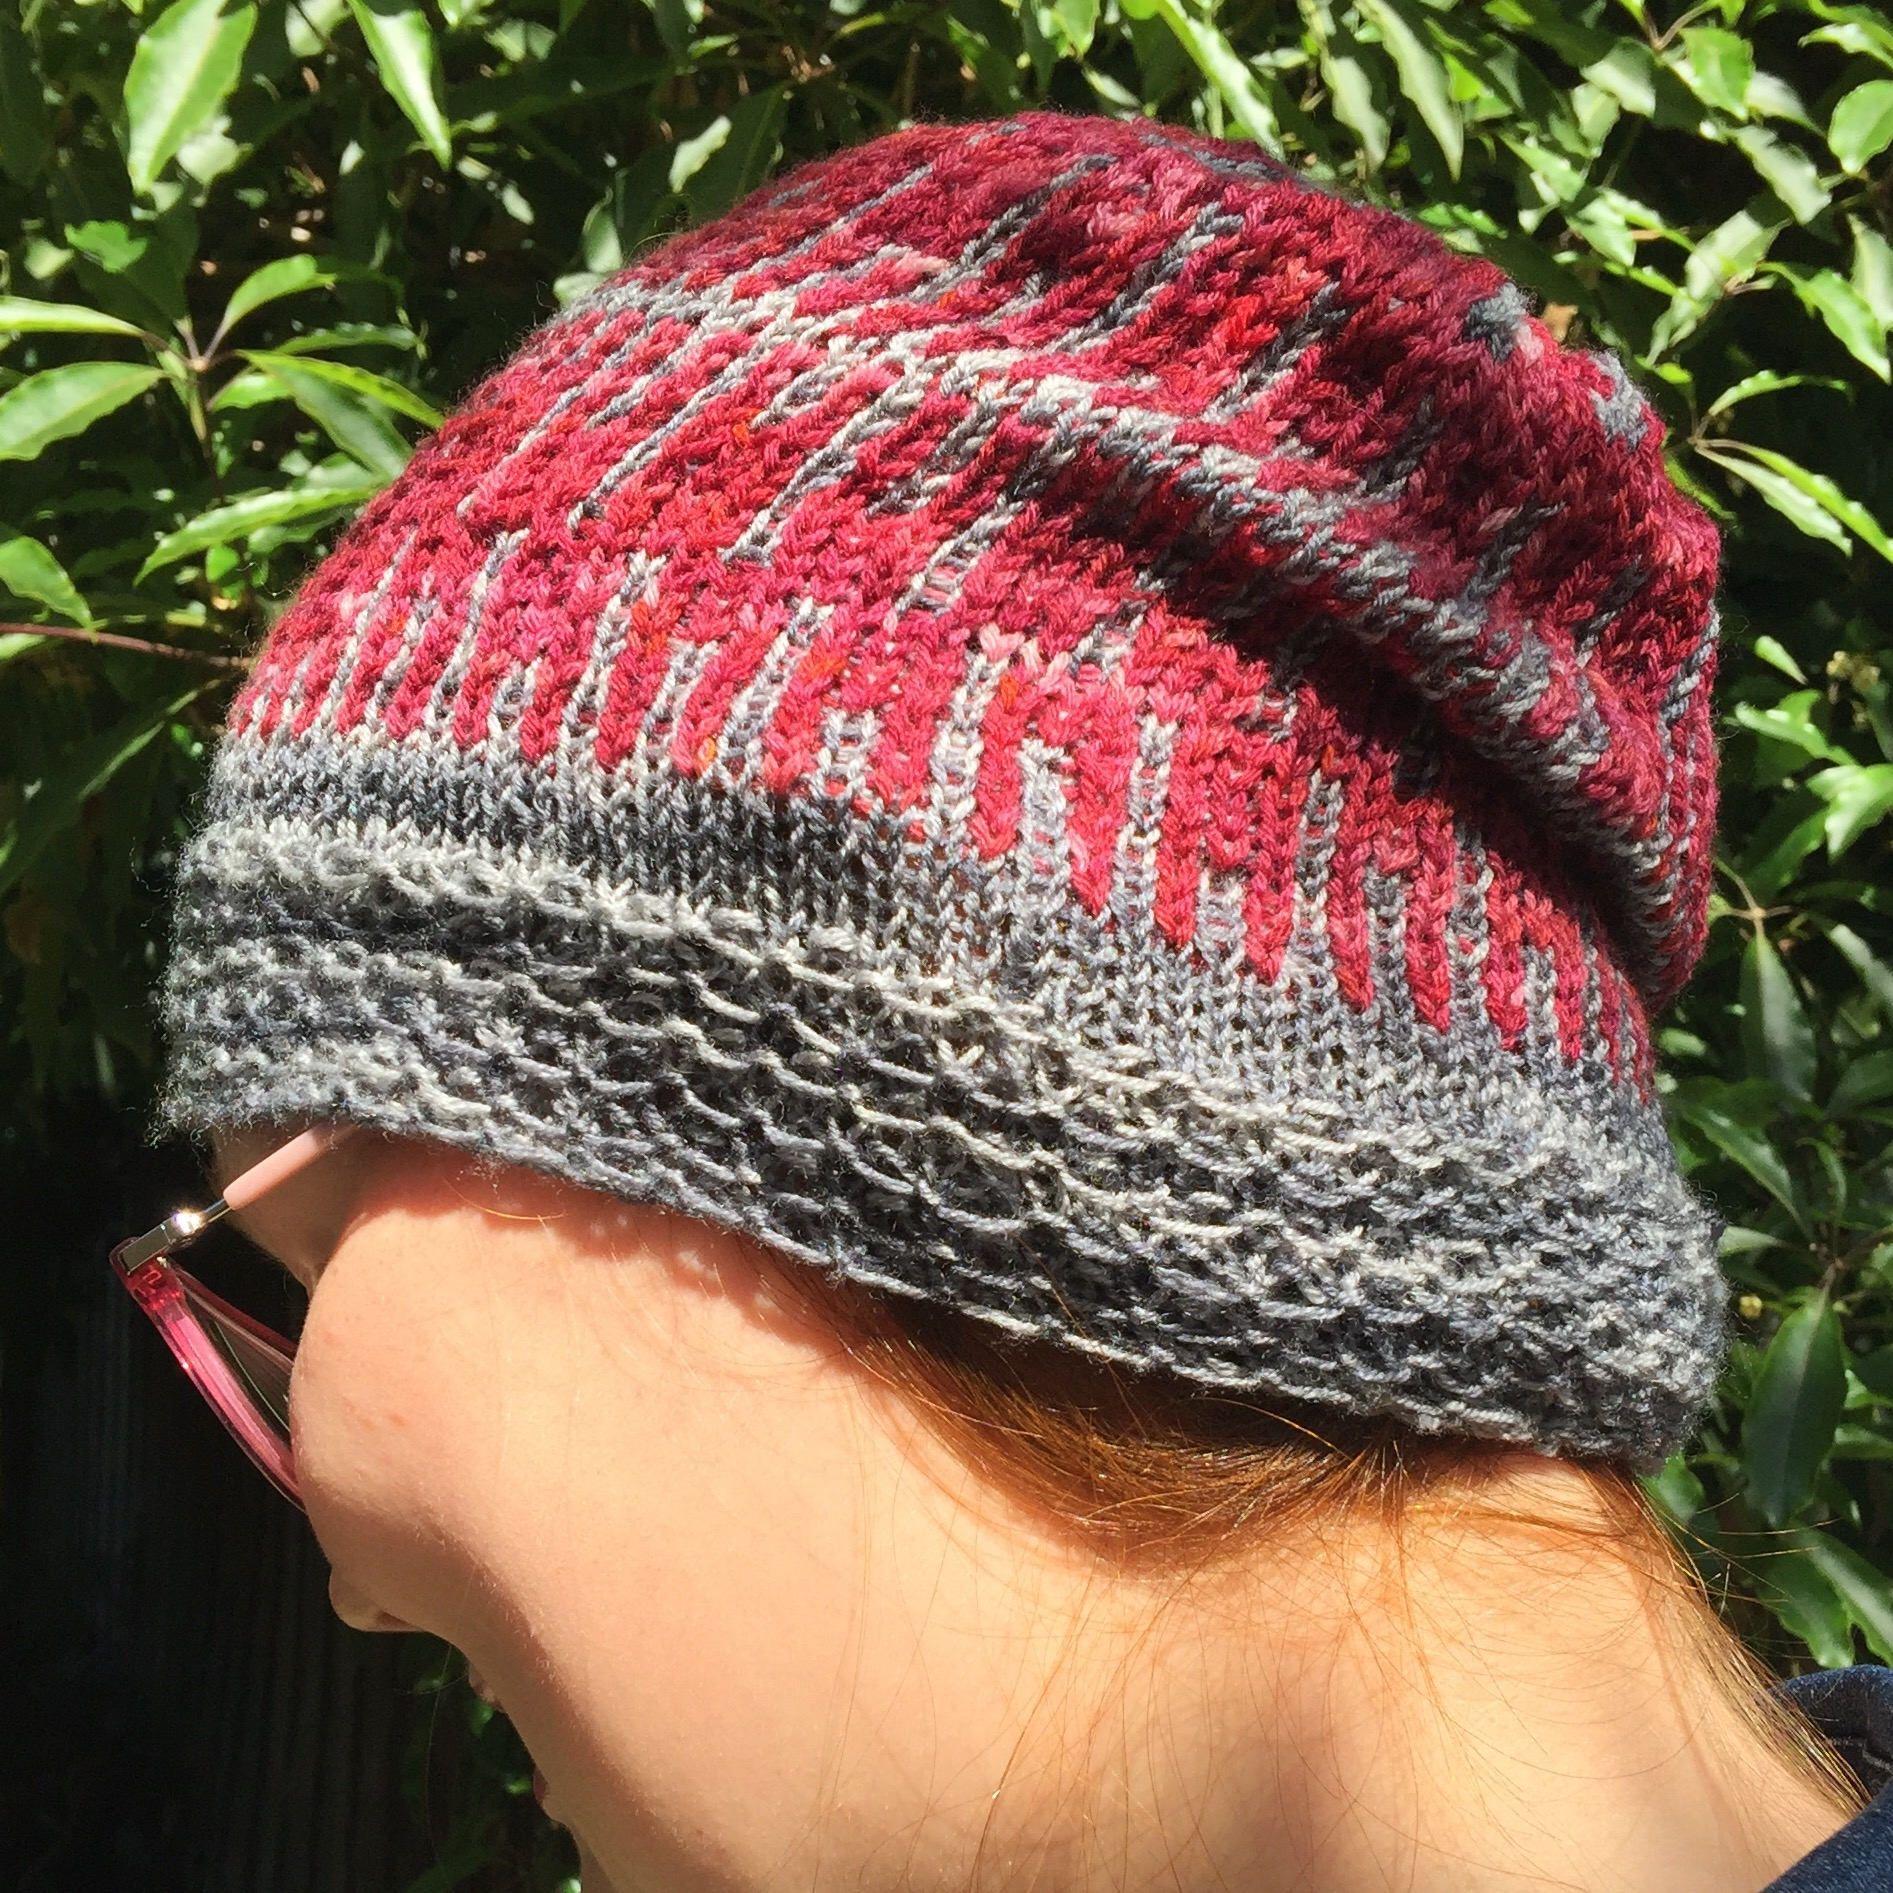 Knitting pattern hat pattern slouchy beanie stranded knitting knitting pattern hat pattern slouchy beanie stranded knitting two colour knitting bankloansurffo Choice Image